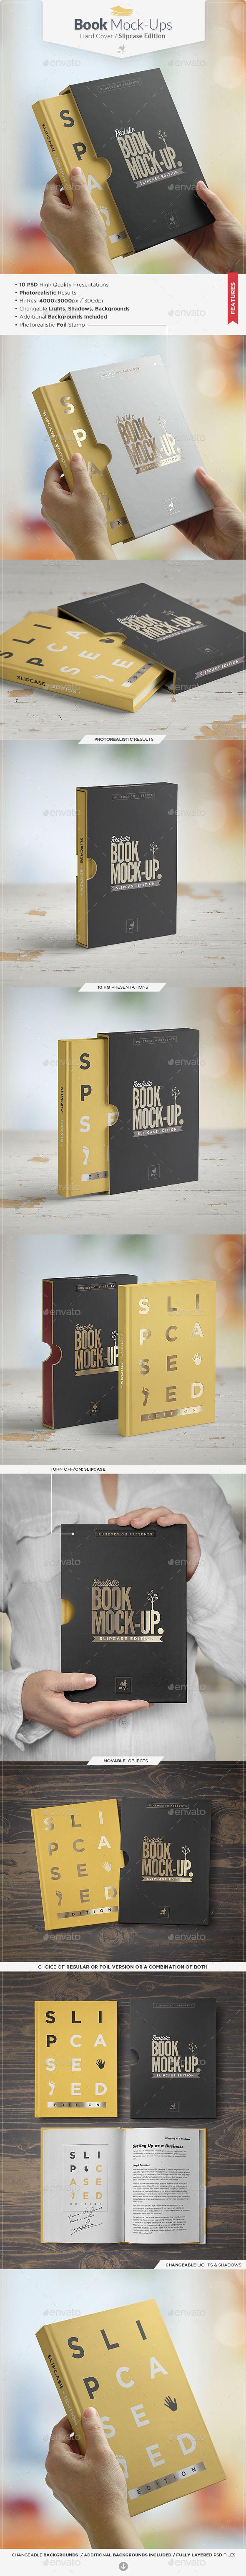 Book Mock-up / Slipcase Edition | #bookmockup | Download: http://graphicriver.net/item/book-mockup-slipcase-edition/9332736?ref=ksioks